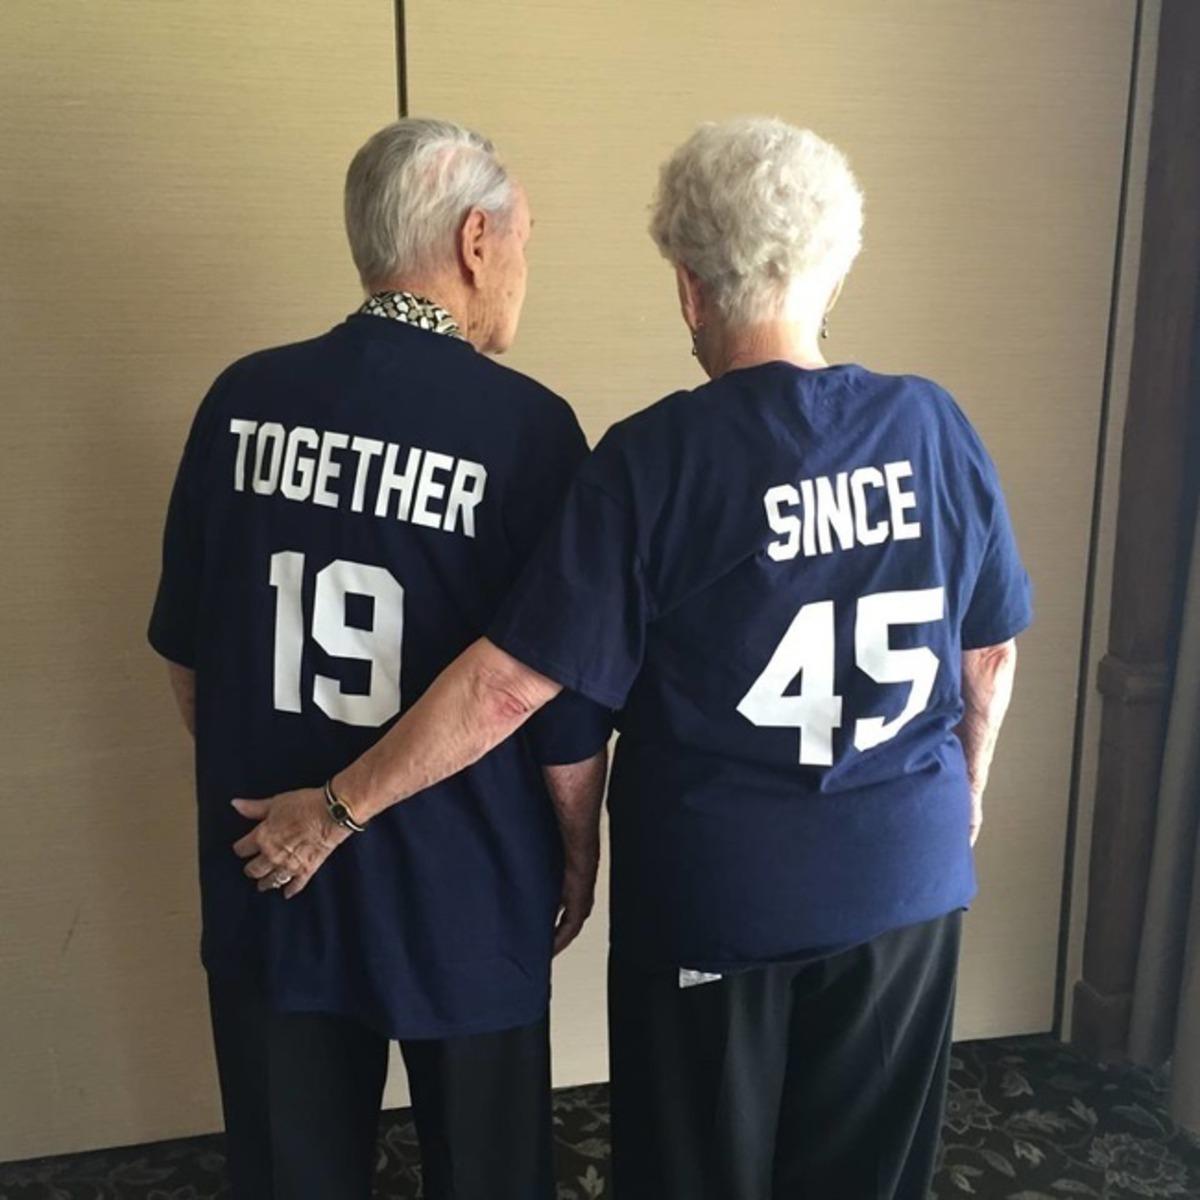 casal de idosos com roupa combinando